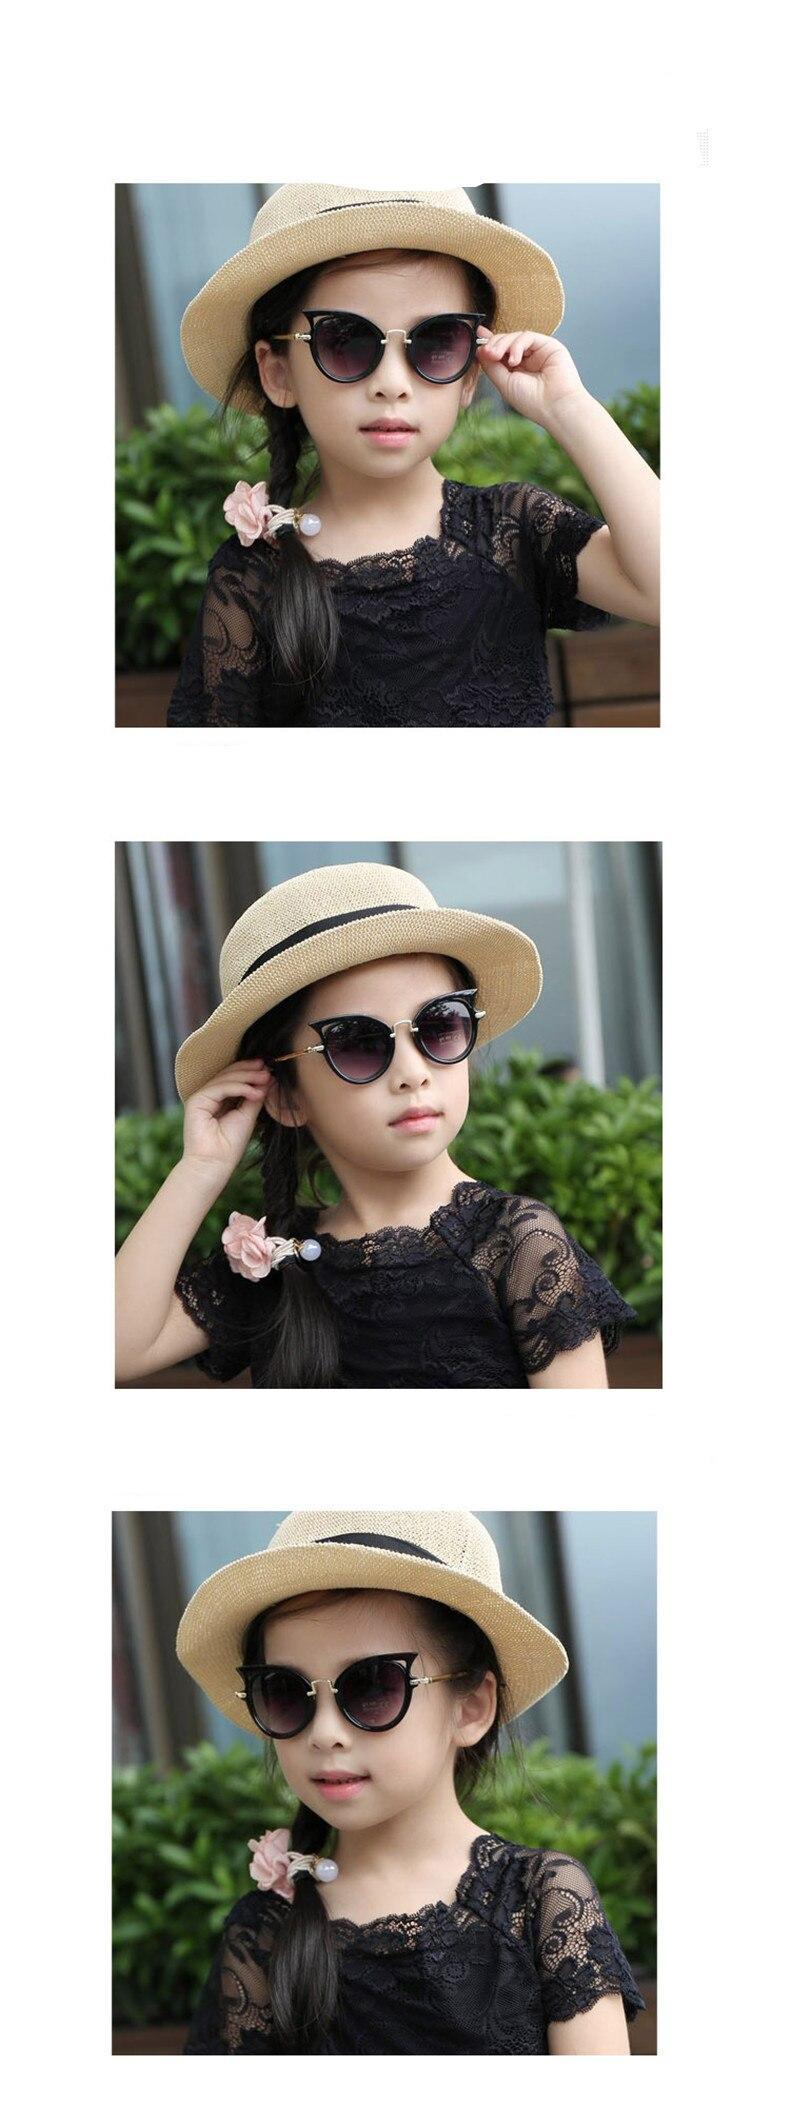 Beautyeye 2018 Kids Sunglasses Girls Brand Cat Eye Children Glasses Boys UV400 Lens Baby Sun glasses Cute Eyewear Shades Goggles